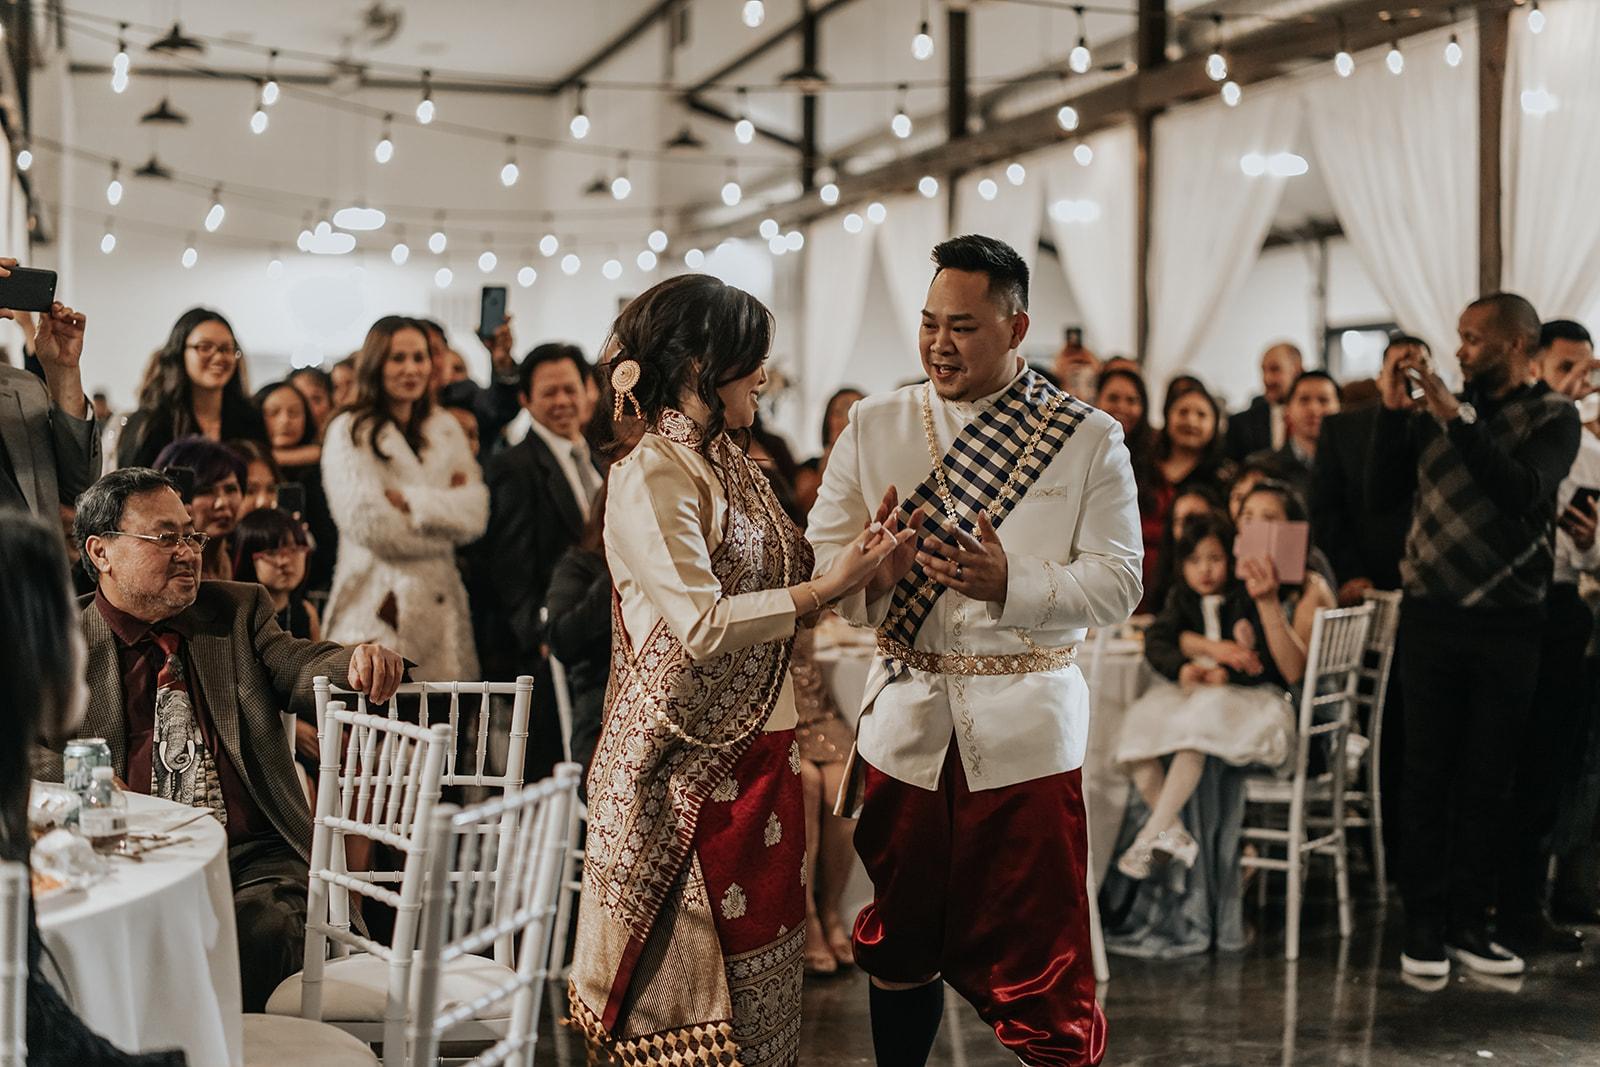 Bixby Tulsa White Barn Wedding Venues 27.jpg